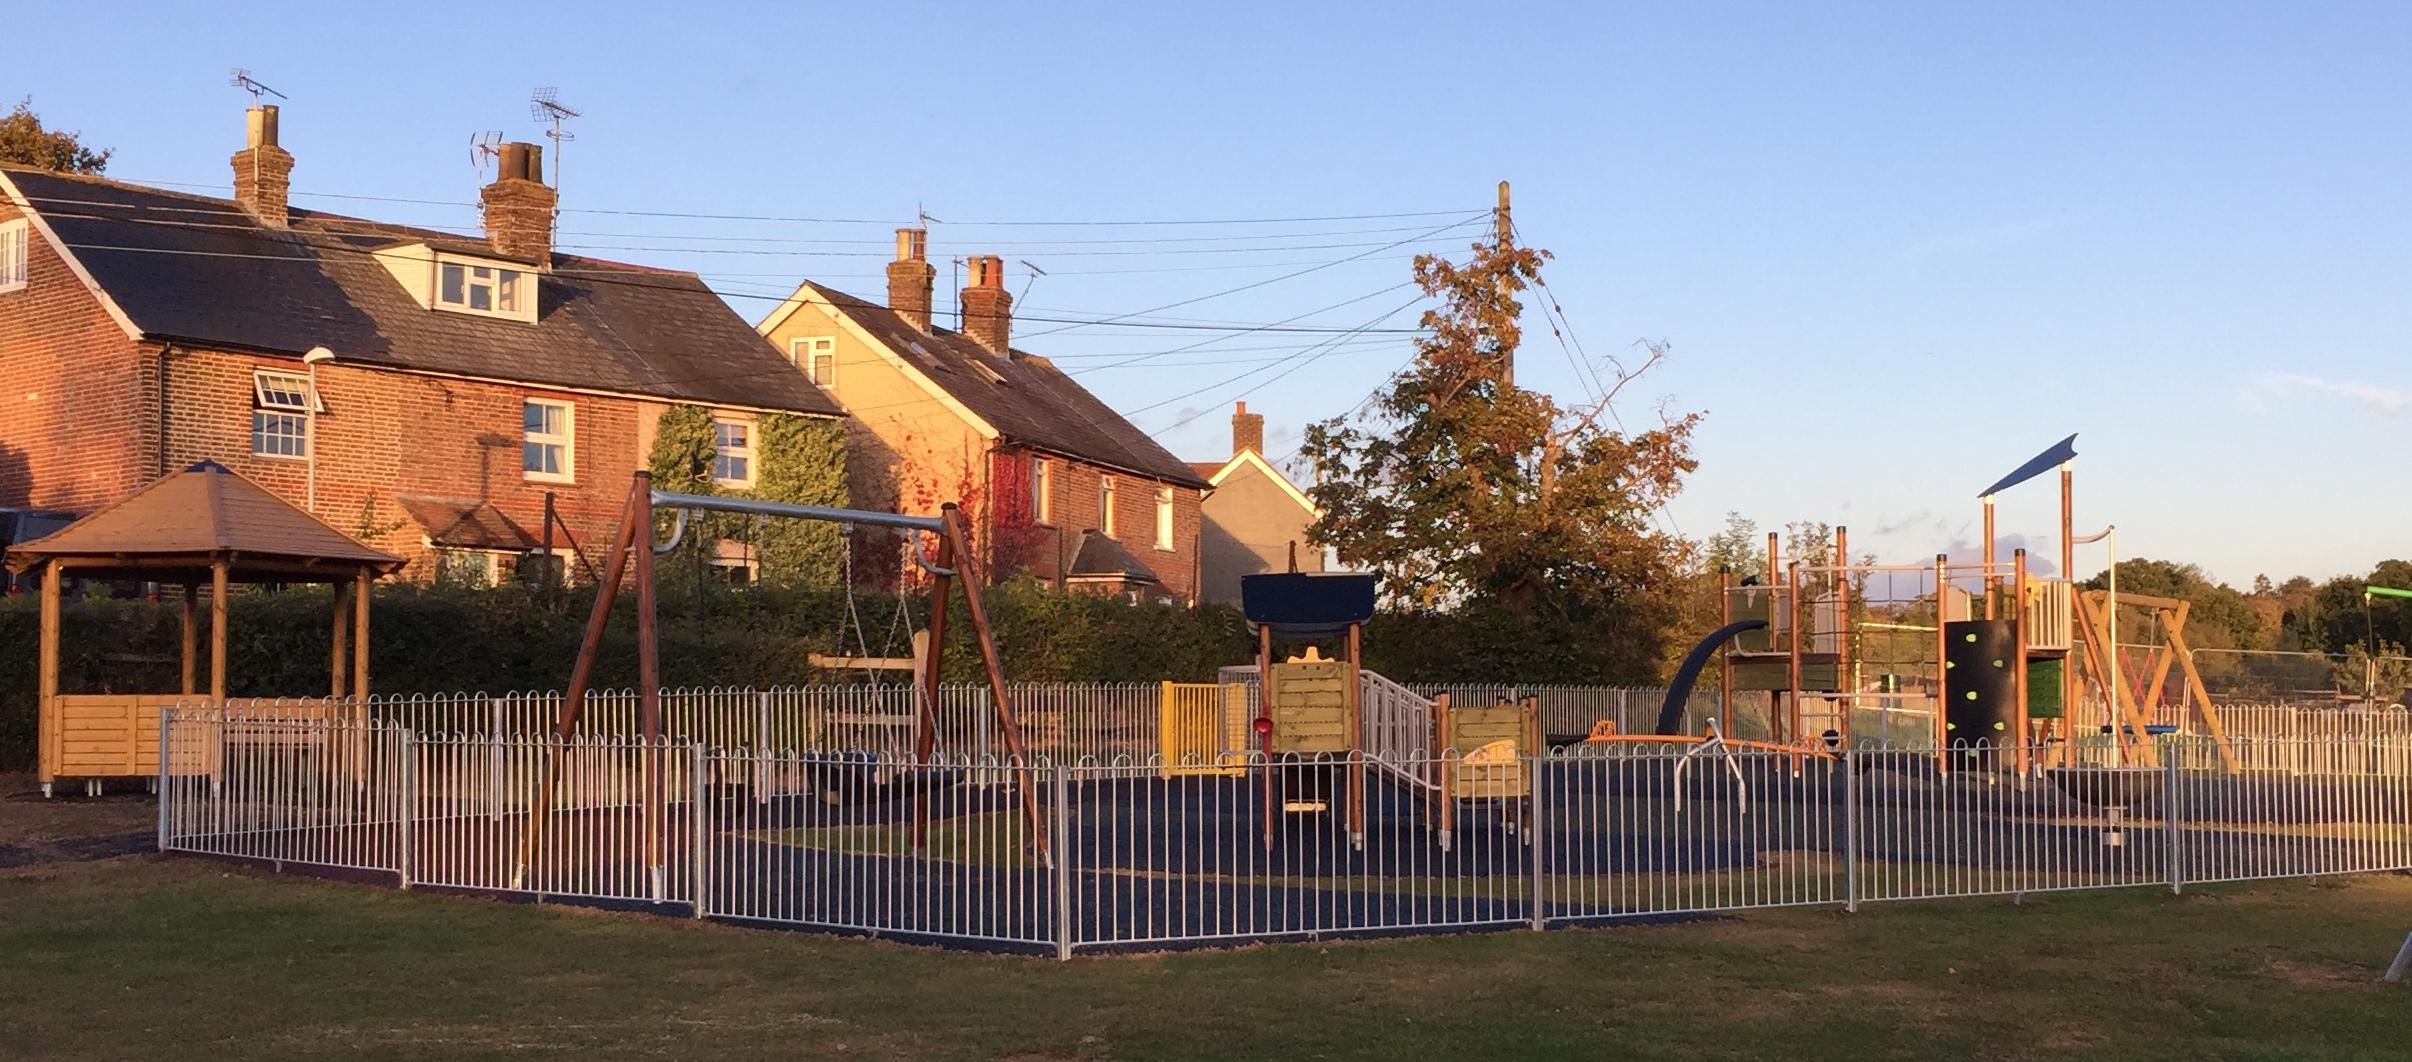 ridgewood-play-area-4